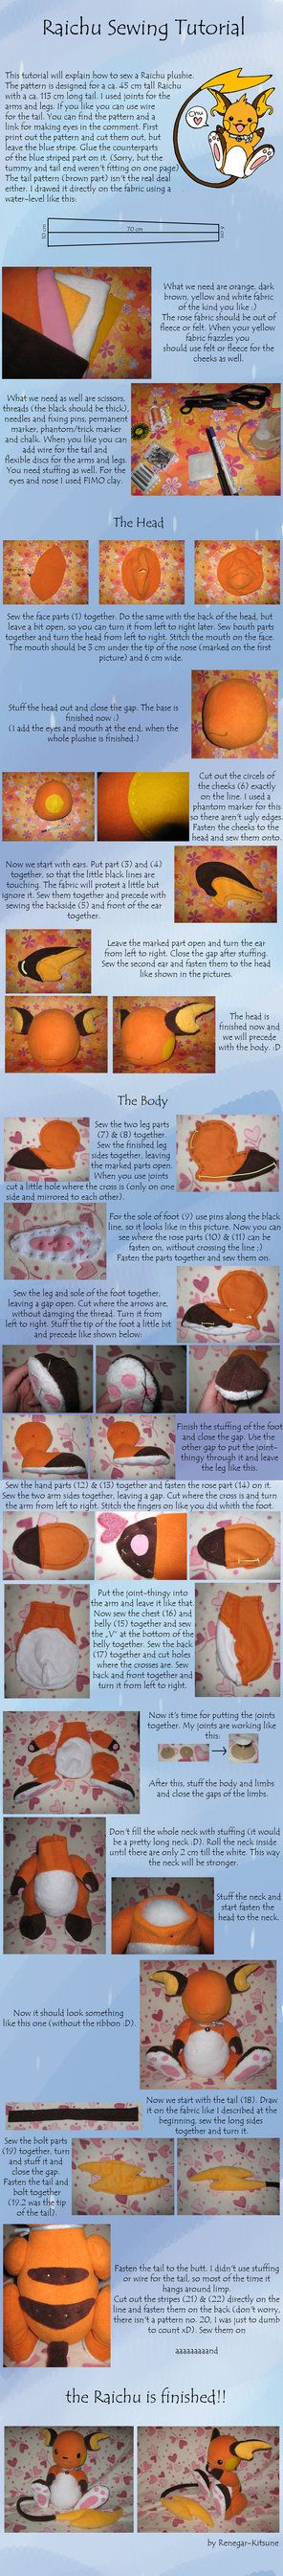 Raichu Sewing Tutorial by *Renegar-Kitsune on deviantART  Pikachu evolves into this one.